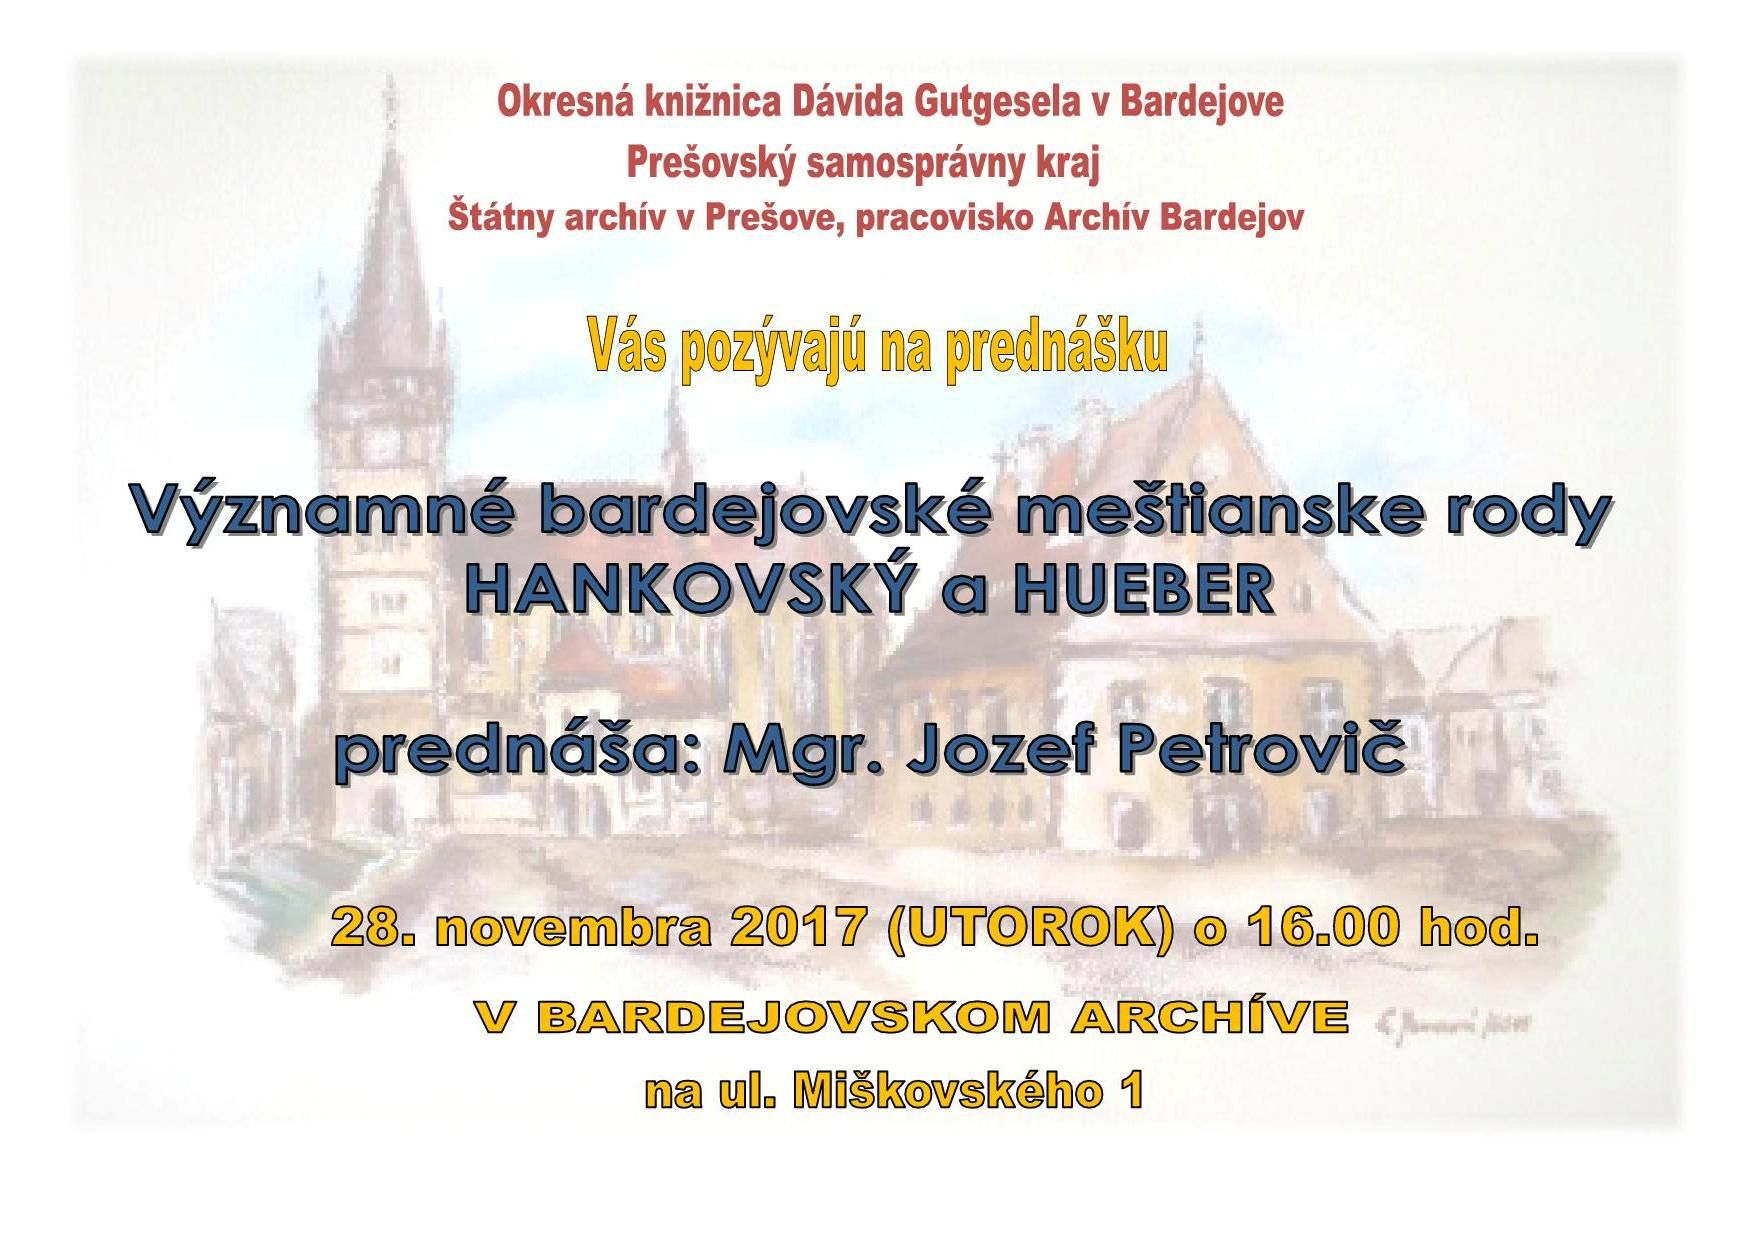 Hankovsky Hueber